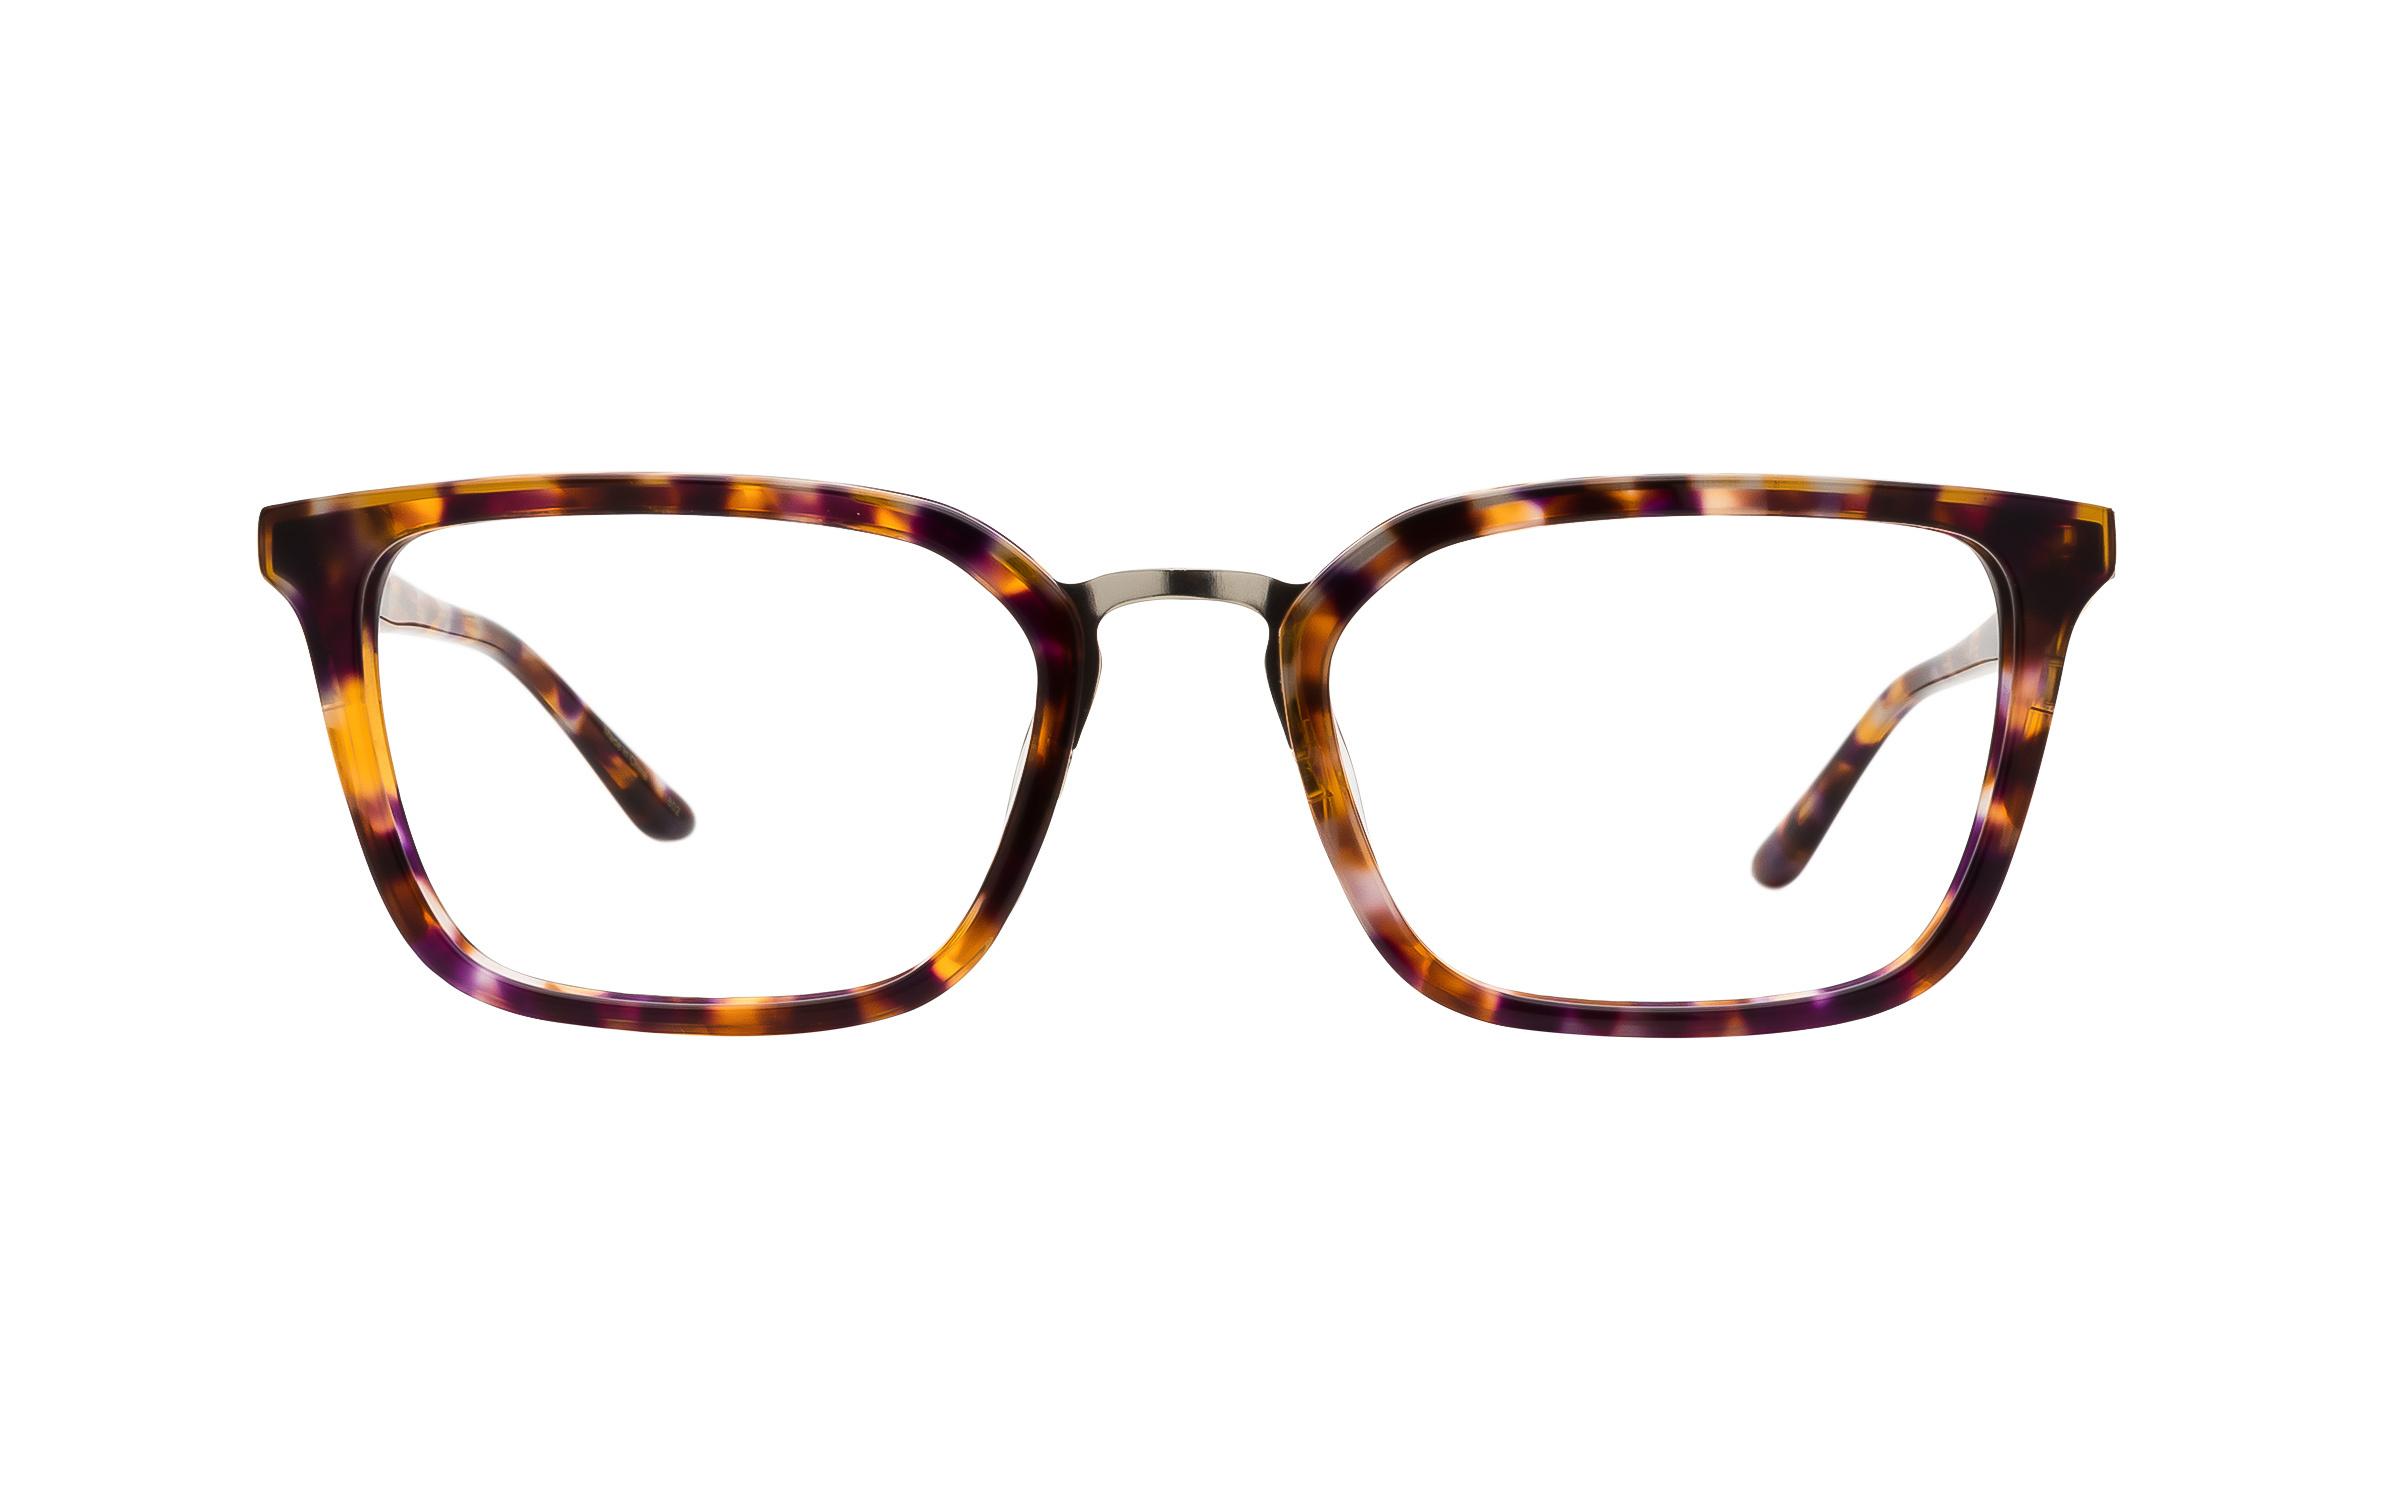 Kam Dhillon Women's Glasses Brown/Purple/Tortoise Acetate/Metal Online Coastal